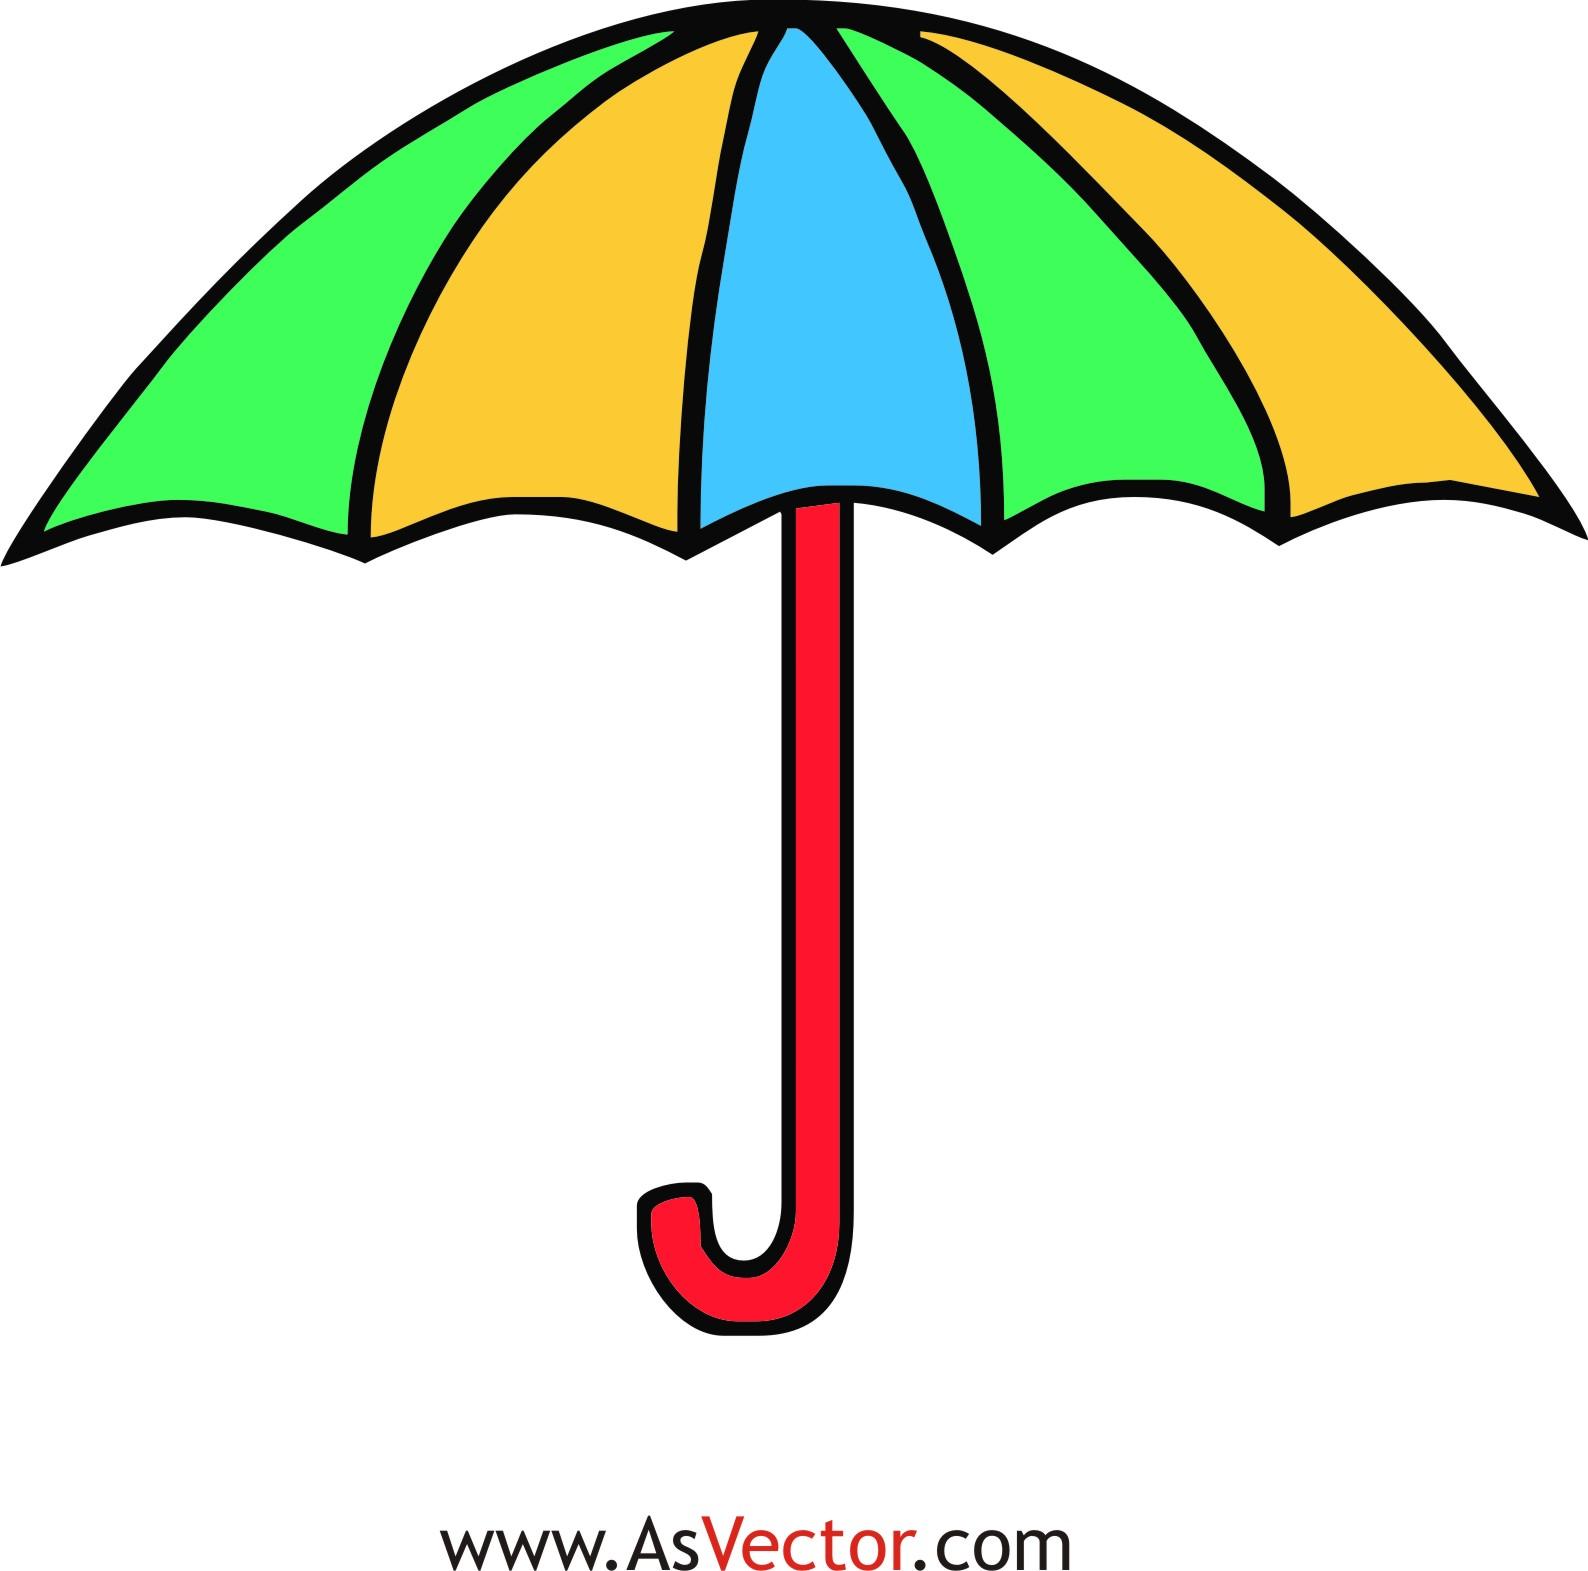 Umbrella Clipart Clipart .-Umbrella clipart clipart .-11